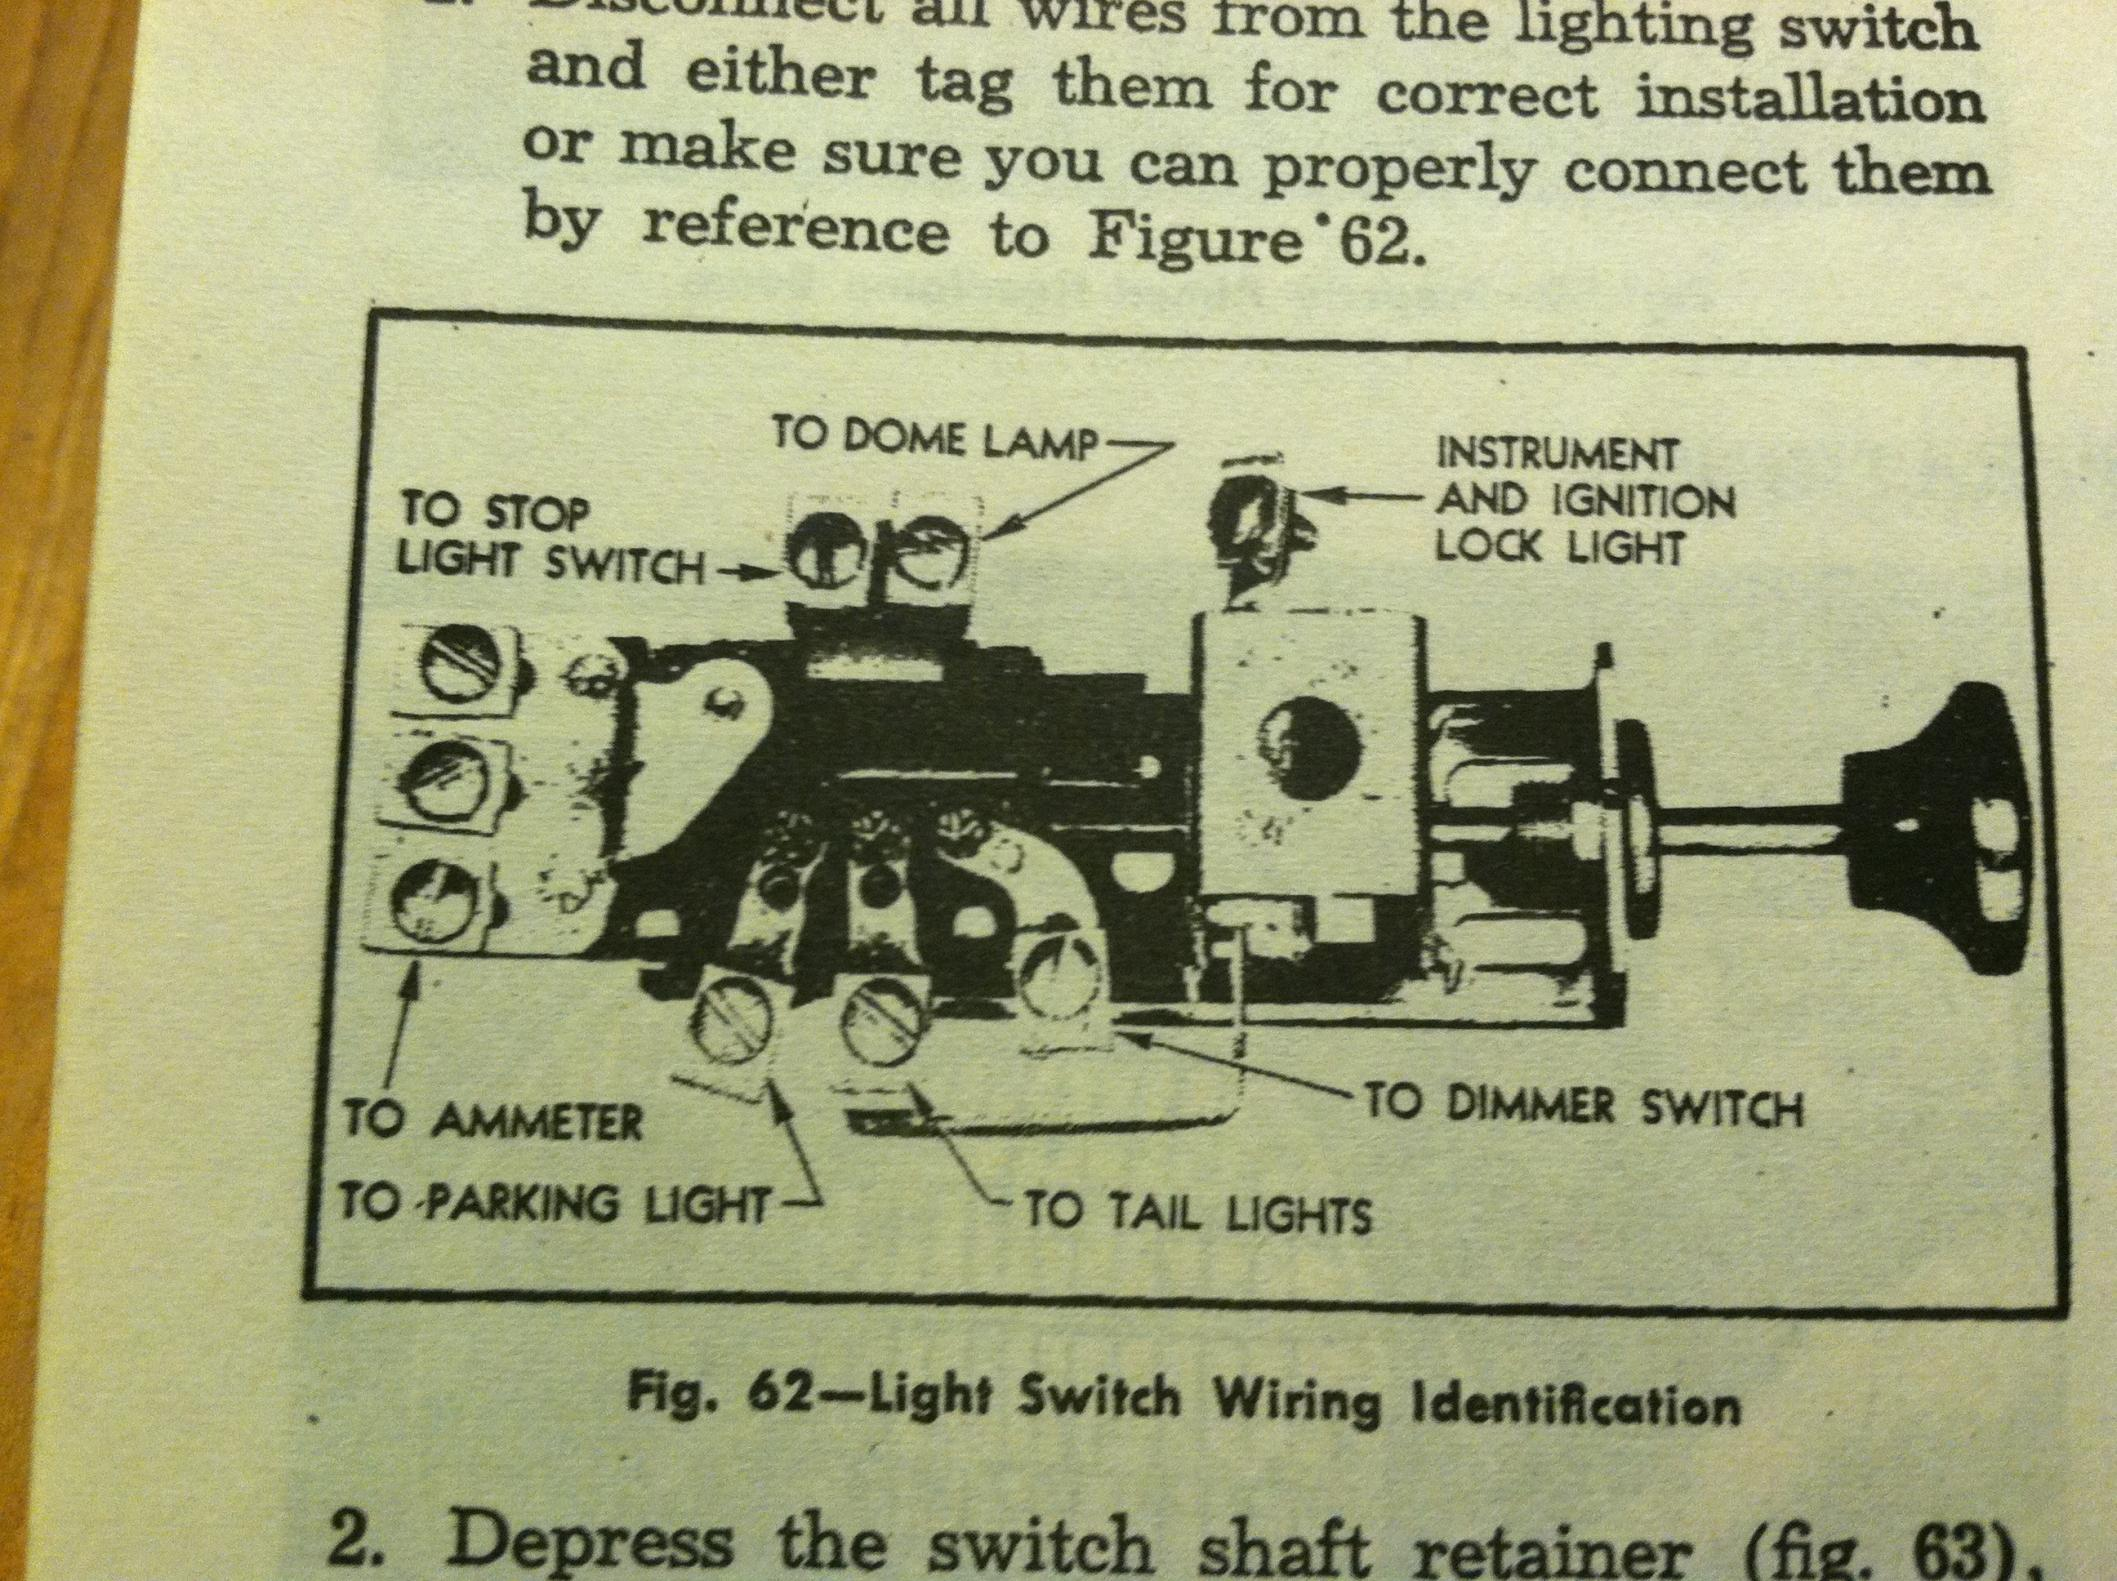 1950 Ford Light Switch Diagram - Wiring Diagrams SchematicAsnières Espaces Verts